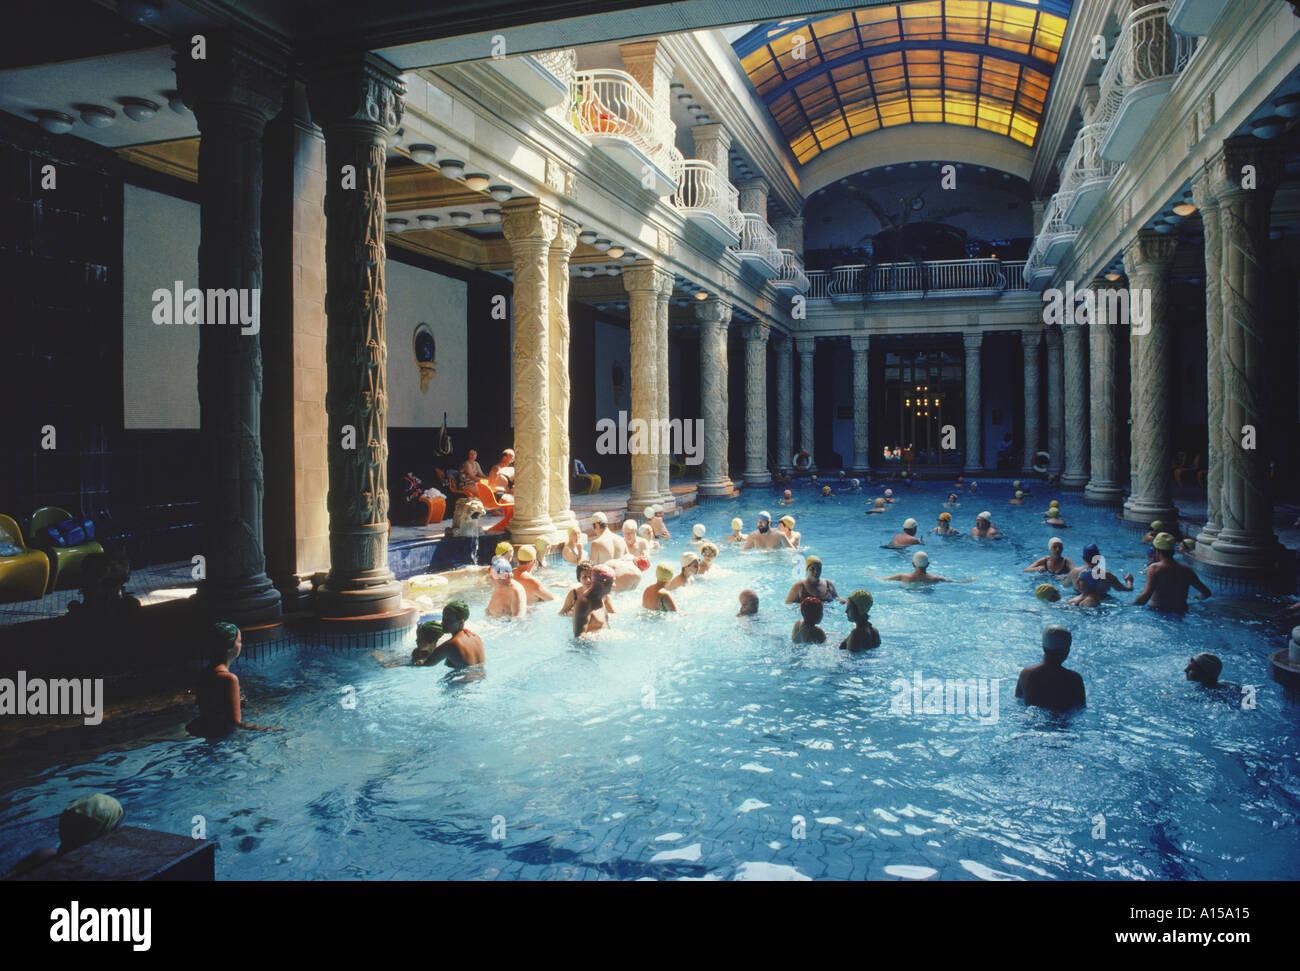 Bagni Termali Gellert : Interno con i bagnanti nel bagno termale gellert budapest in